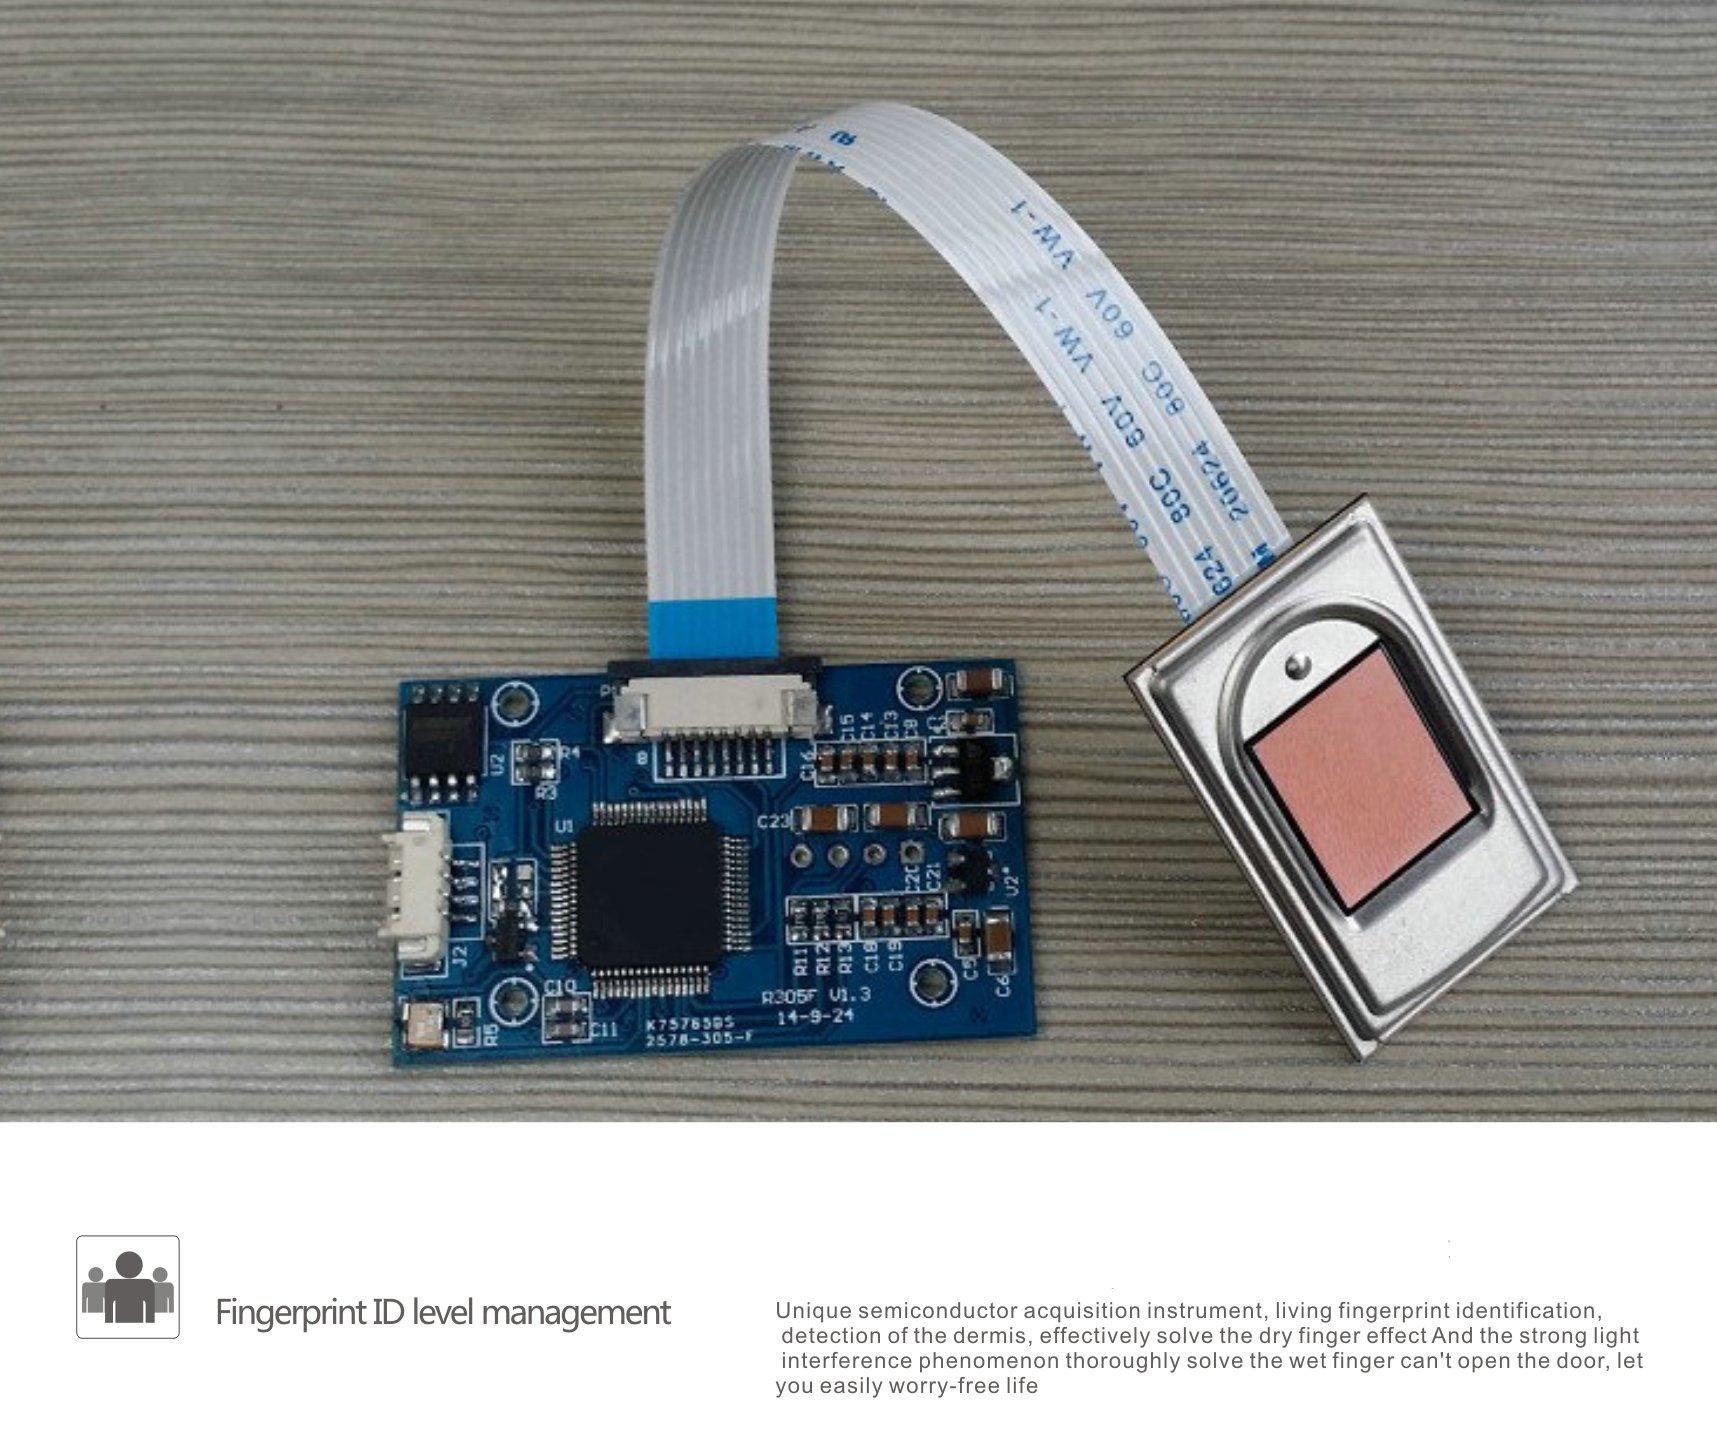 LEGU Fingerprint and Touchscreen Keyless Smart Lever Lock for Door fingerprint+password+card+key/Security intelligent anti-theft lock (Left handed) by LEGU (Image #4)